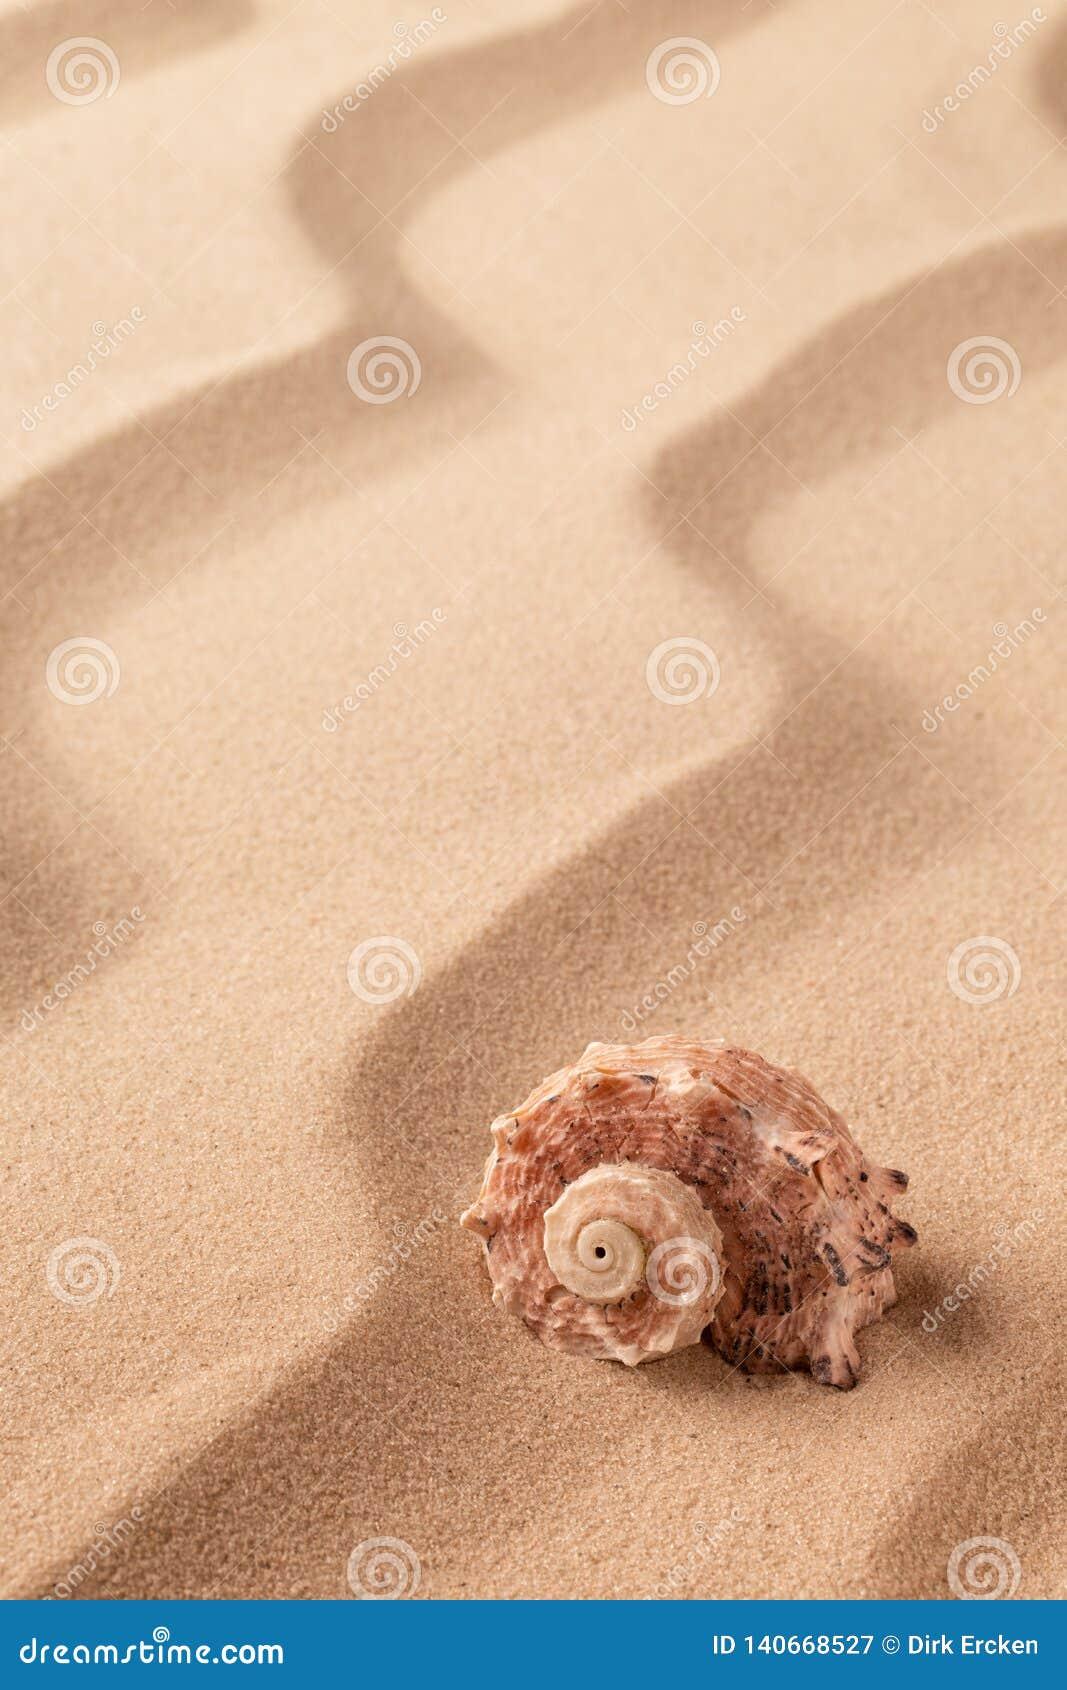 Spiral seashell on tropical beach sand